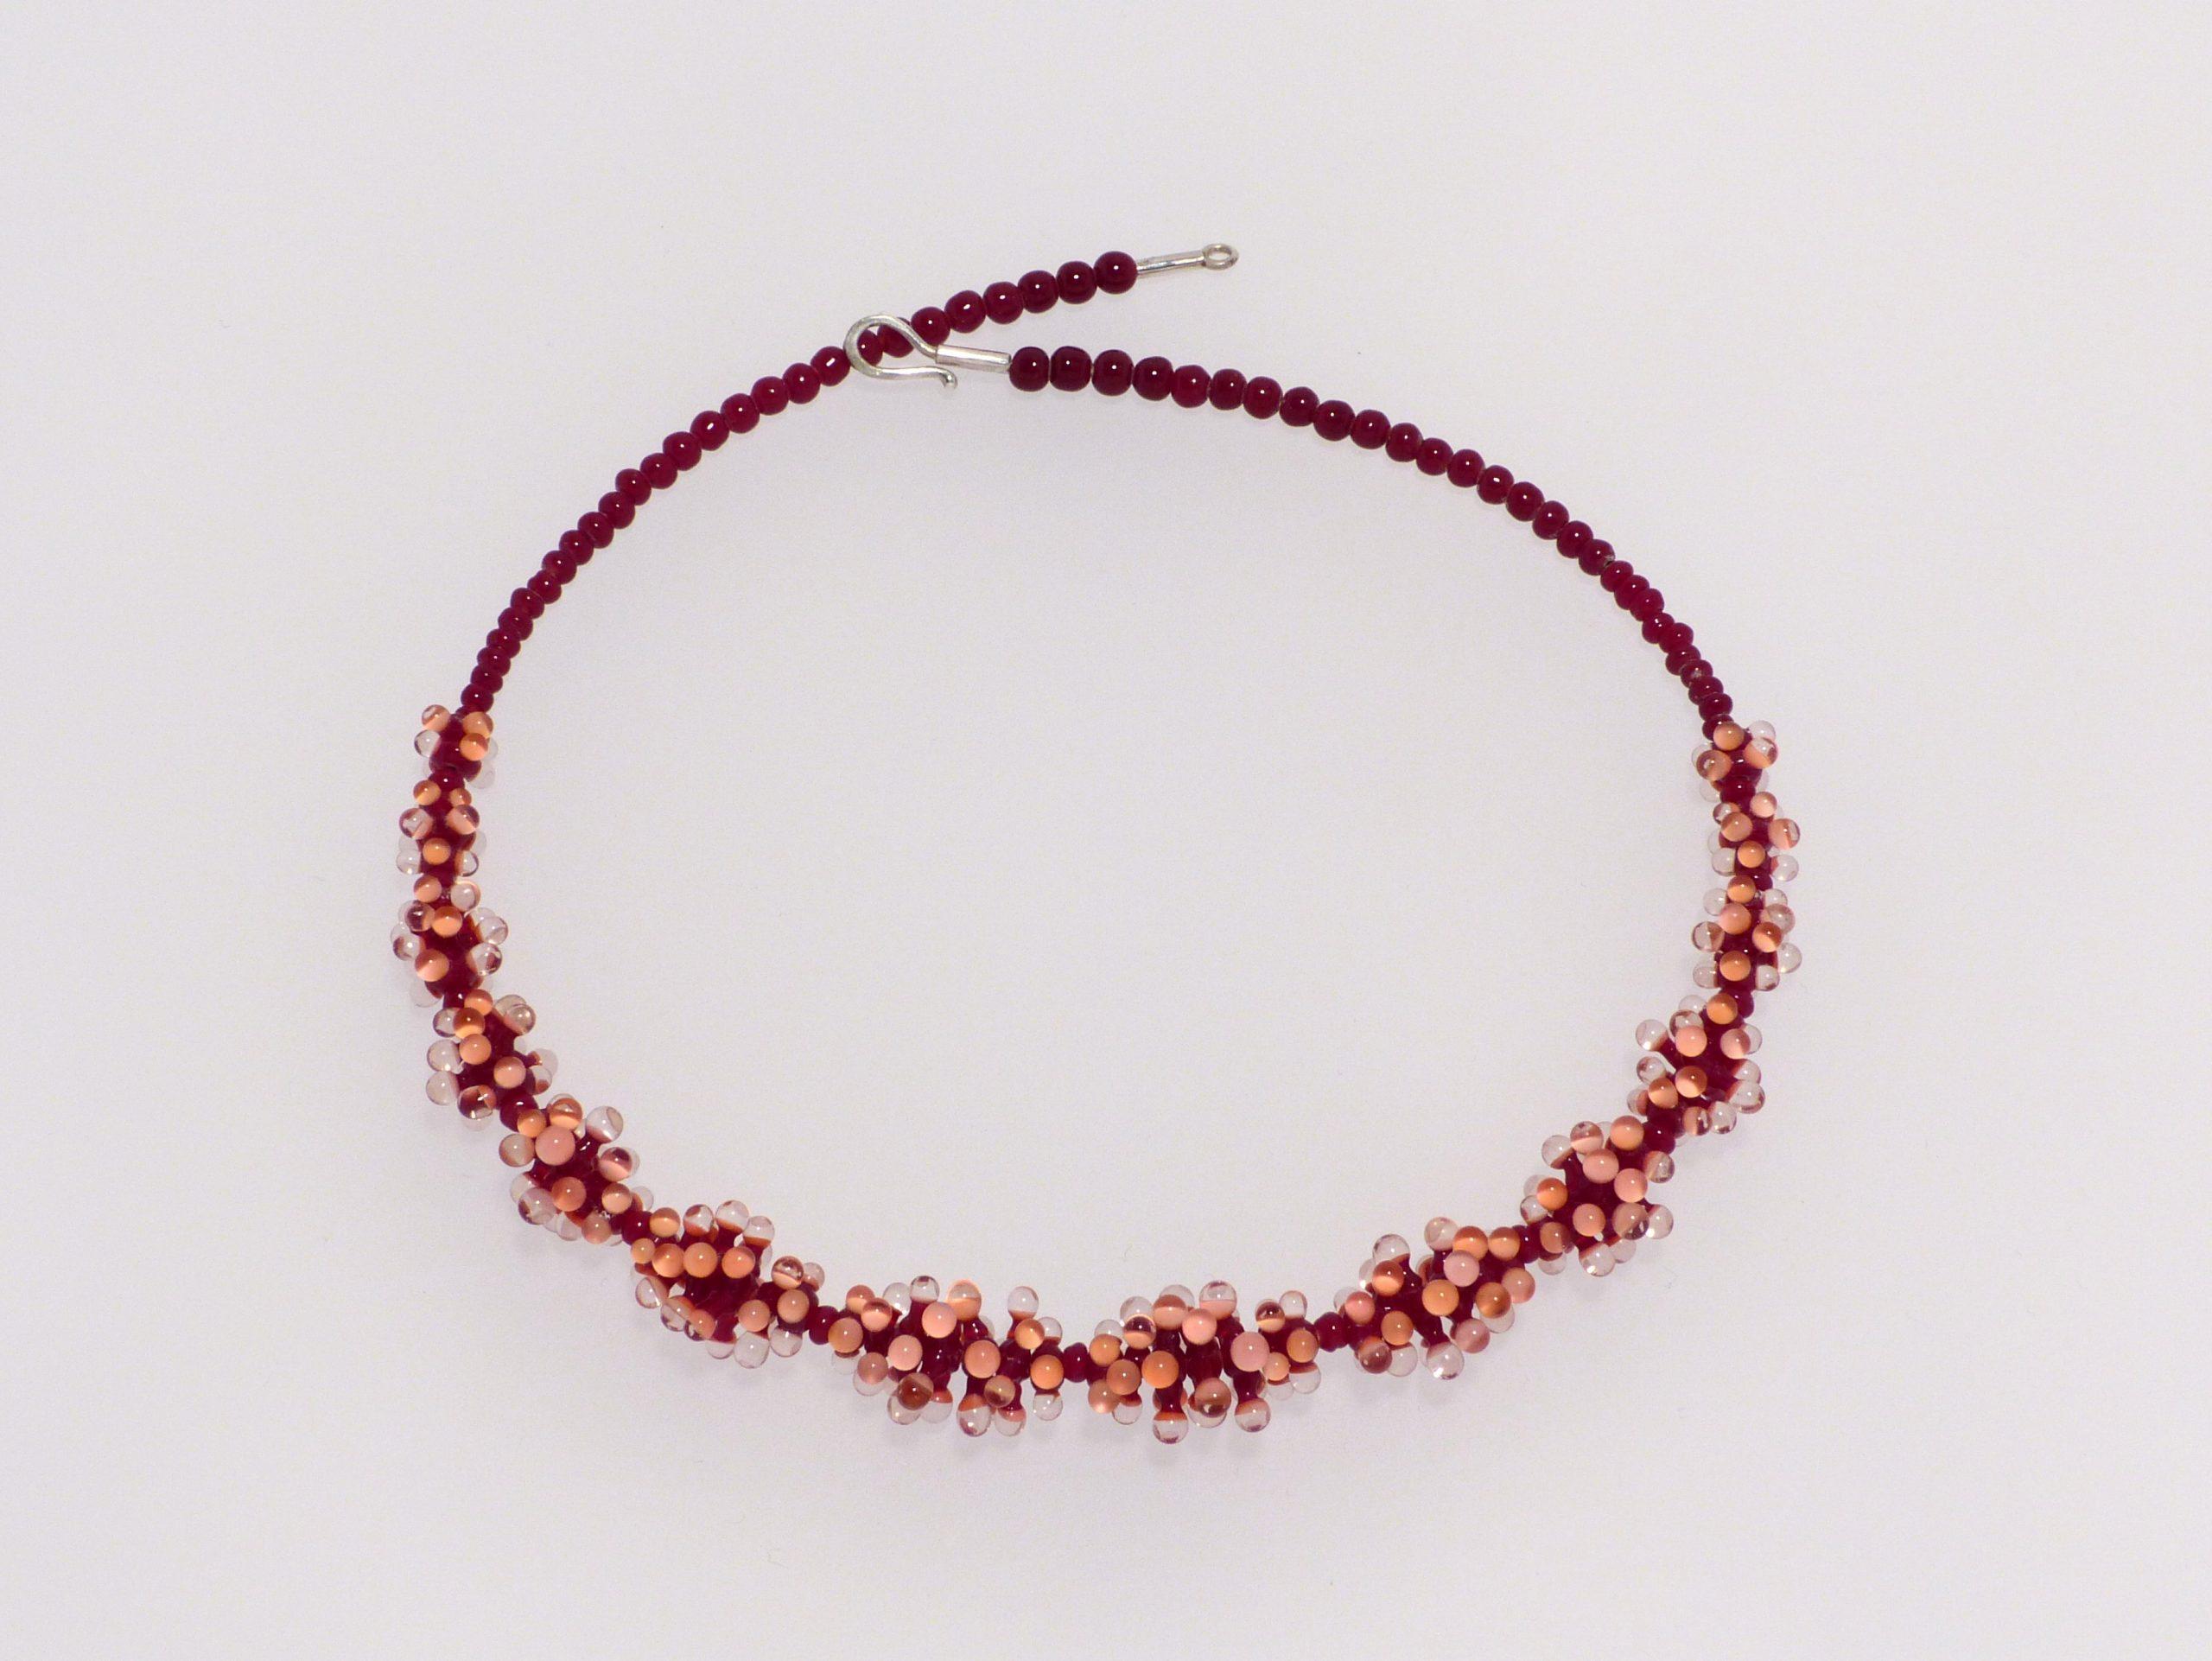 Seeanemone kugelig, d.rot-pink-rosa | Glas, Stahlseil, Silber | 170992-19